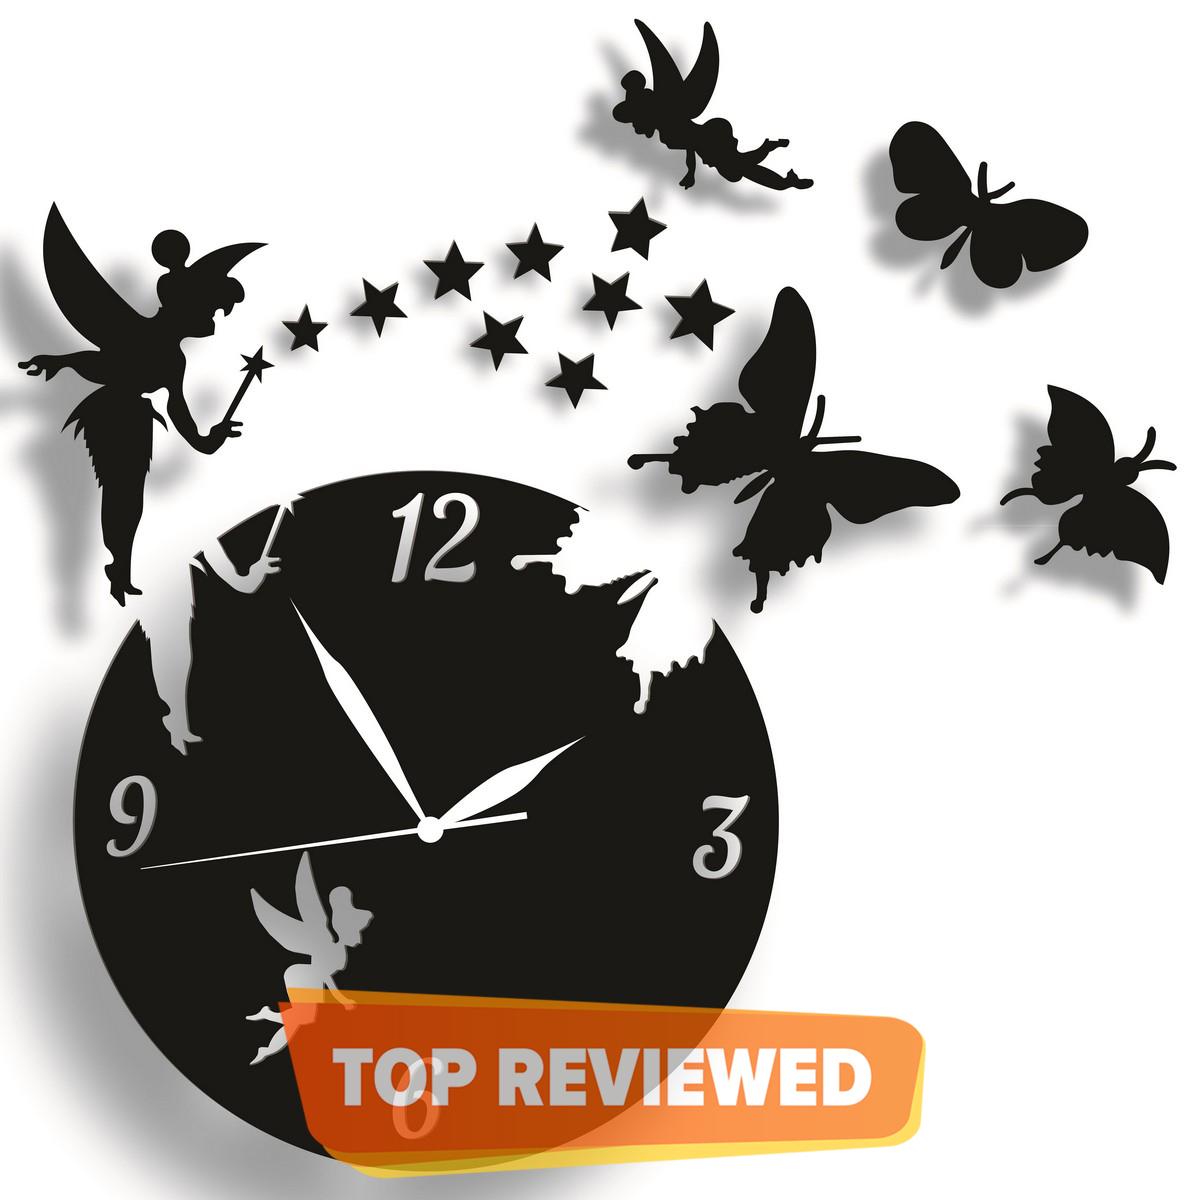 Fairy Wooden Wall Clock, Girls Room 3D Laser Cut Wall Clock In Modern Fairy With Stars & Butterflies